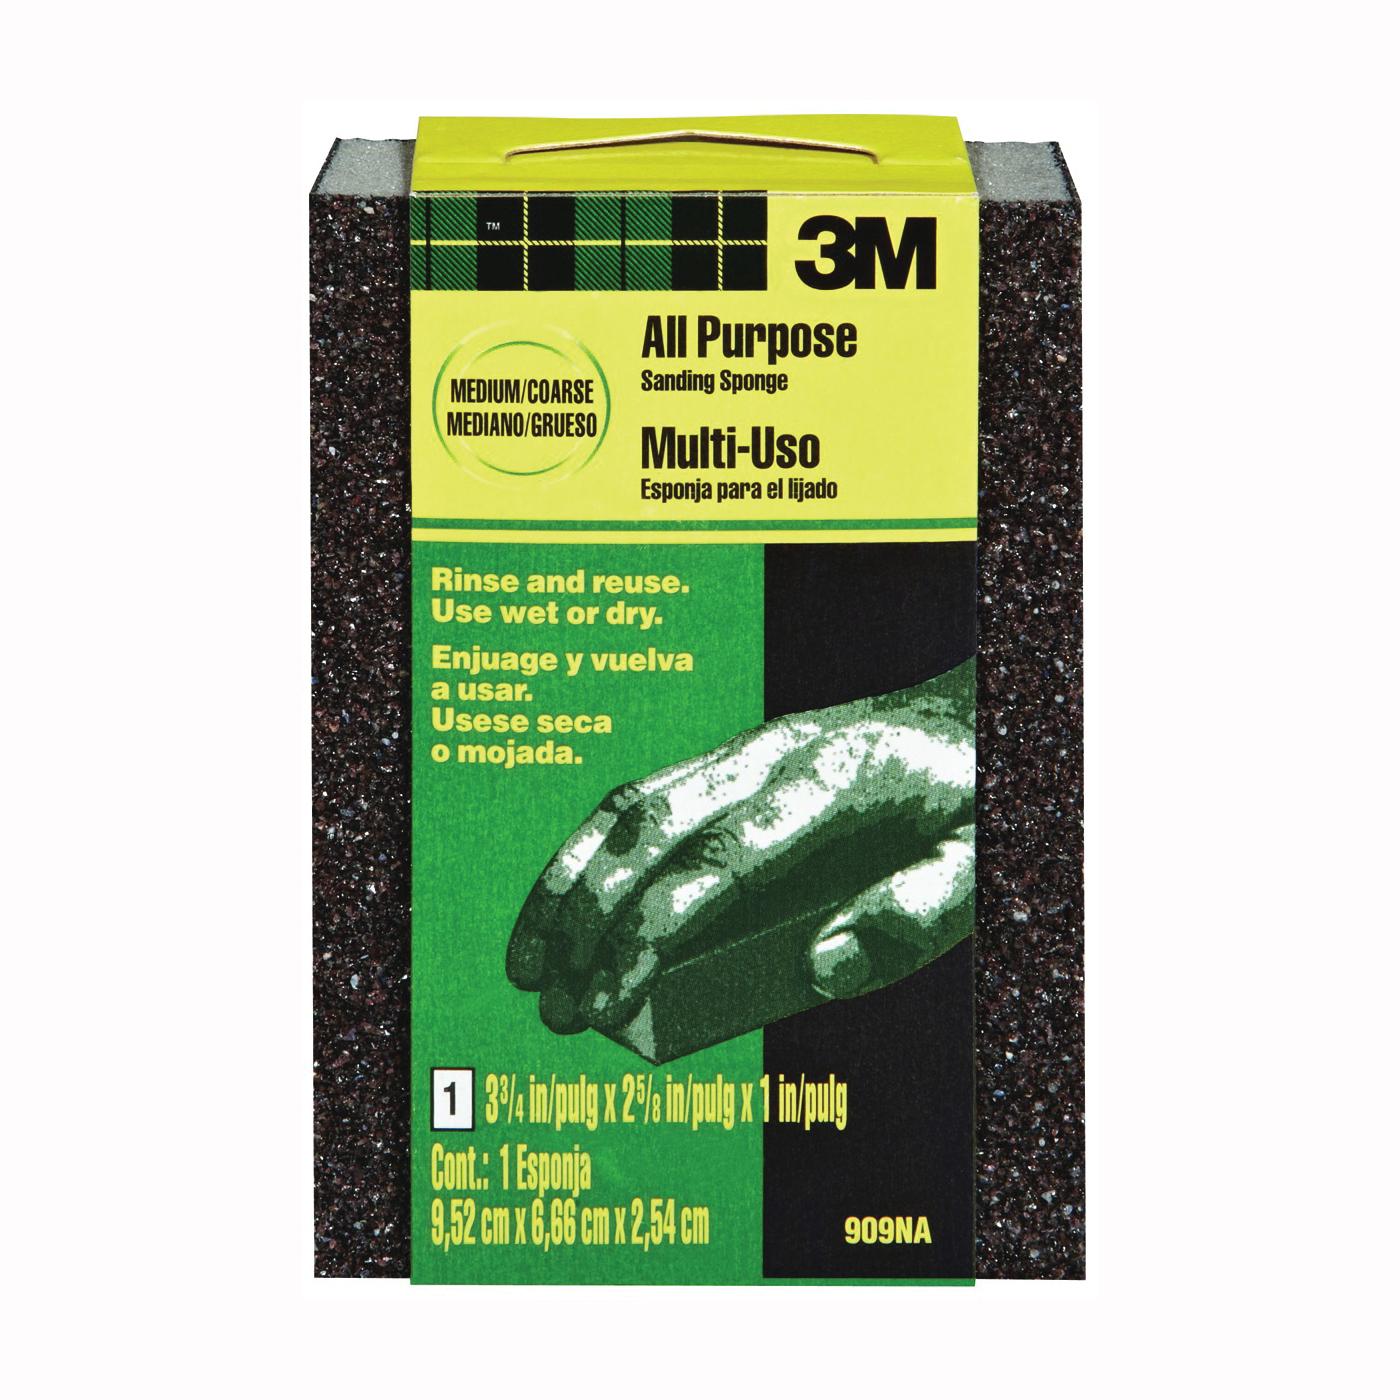 Picture of 3M 909 Sanding Sponge, 3-3/4 in L, 2-5/8 in W, Coarse/Medium, Aluminum Oxide Abrasive